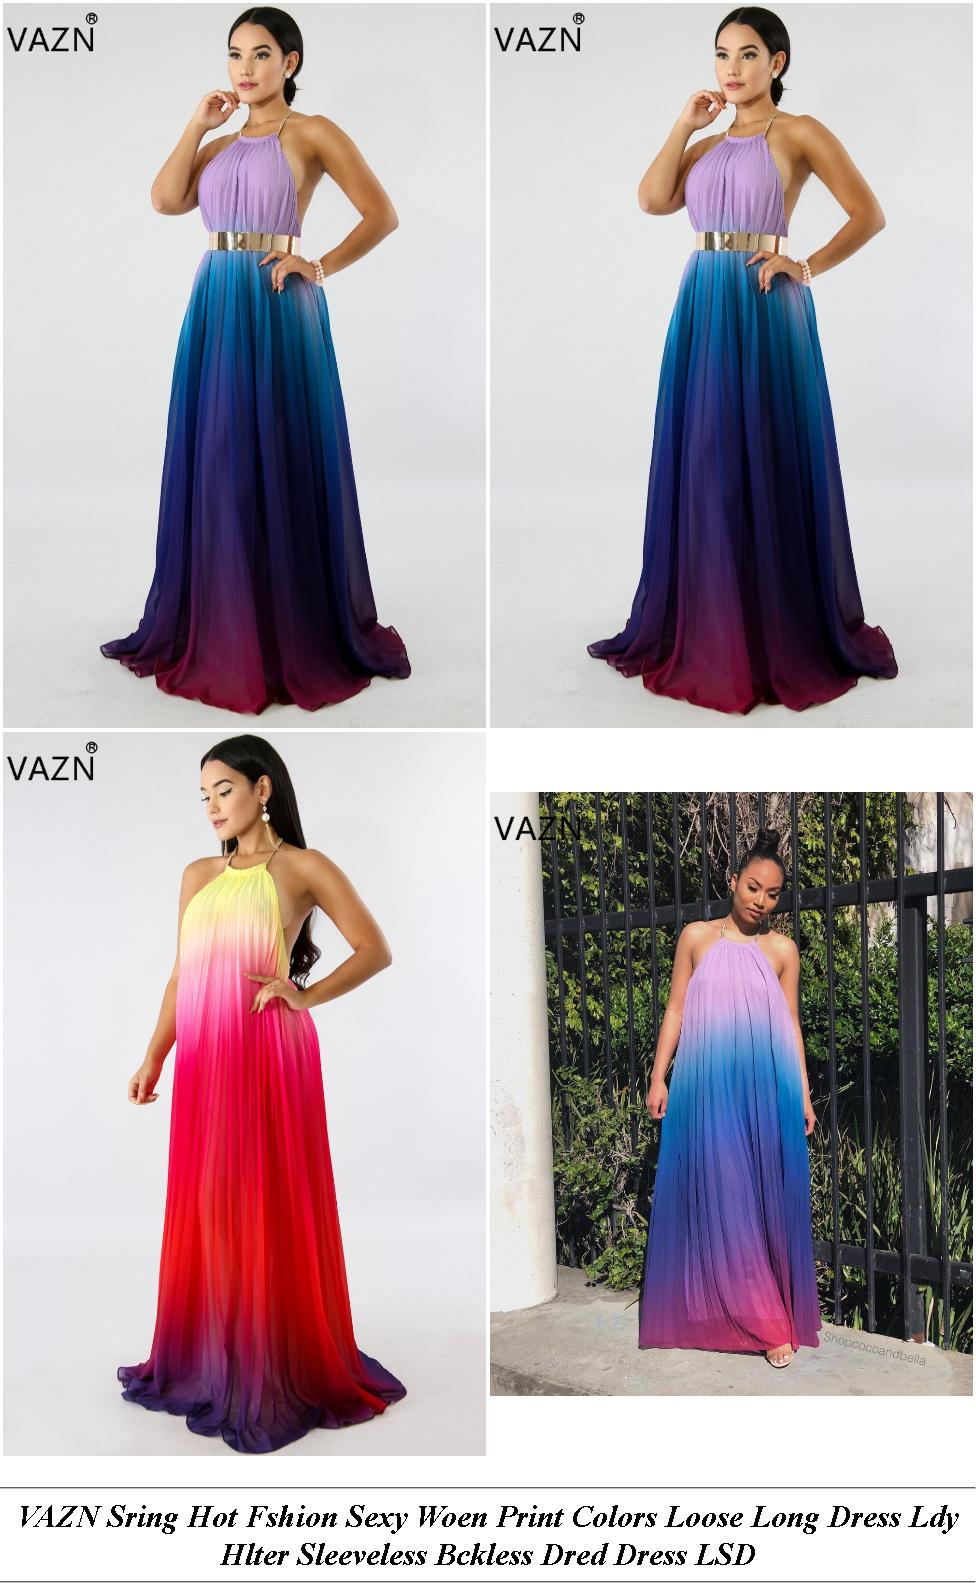 Dress Code For Jury Duty - House For Sale On Rands Road Ajax - Australian Designer Formal Dresses